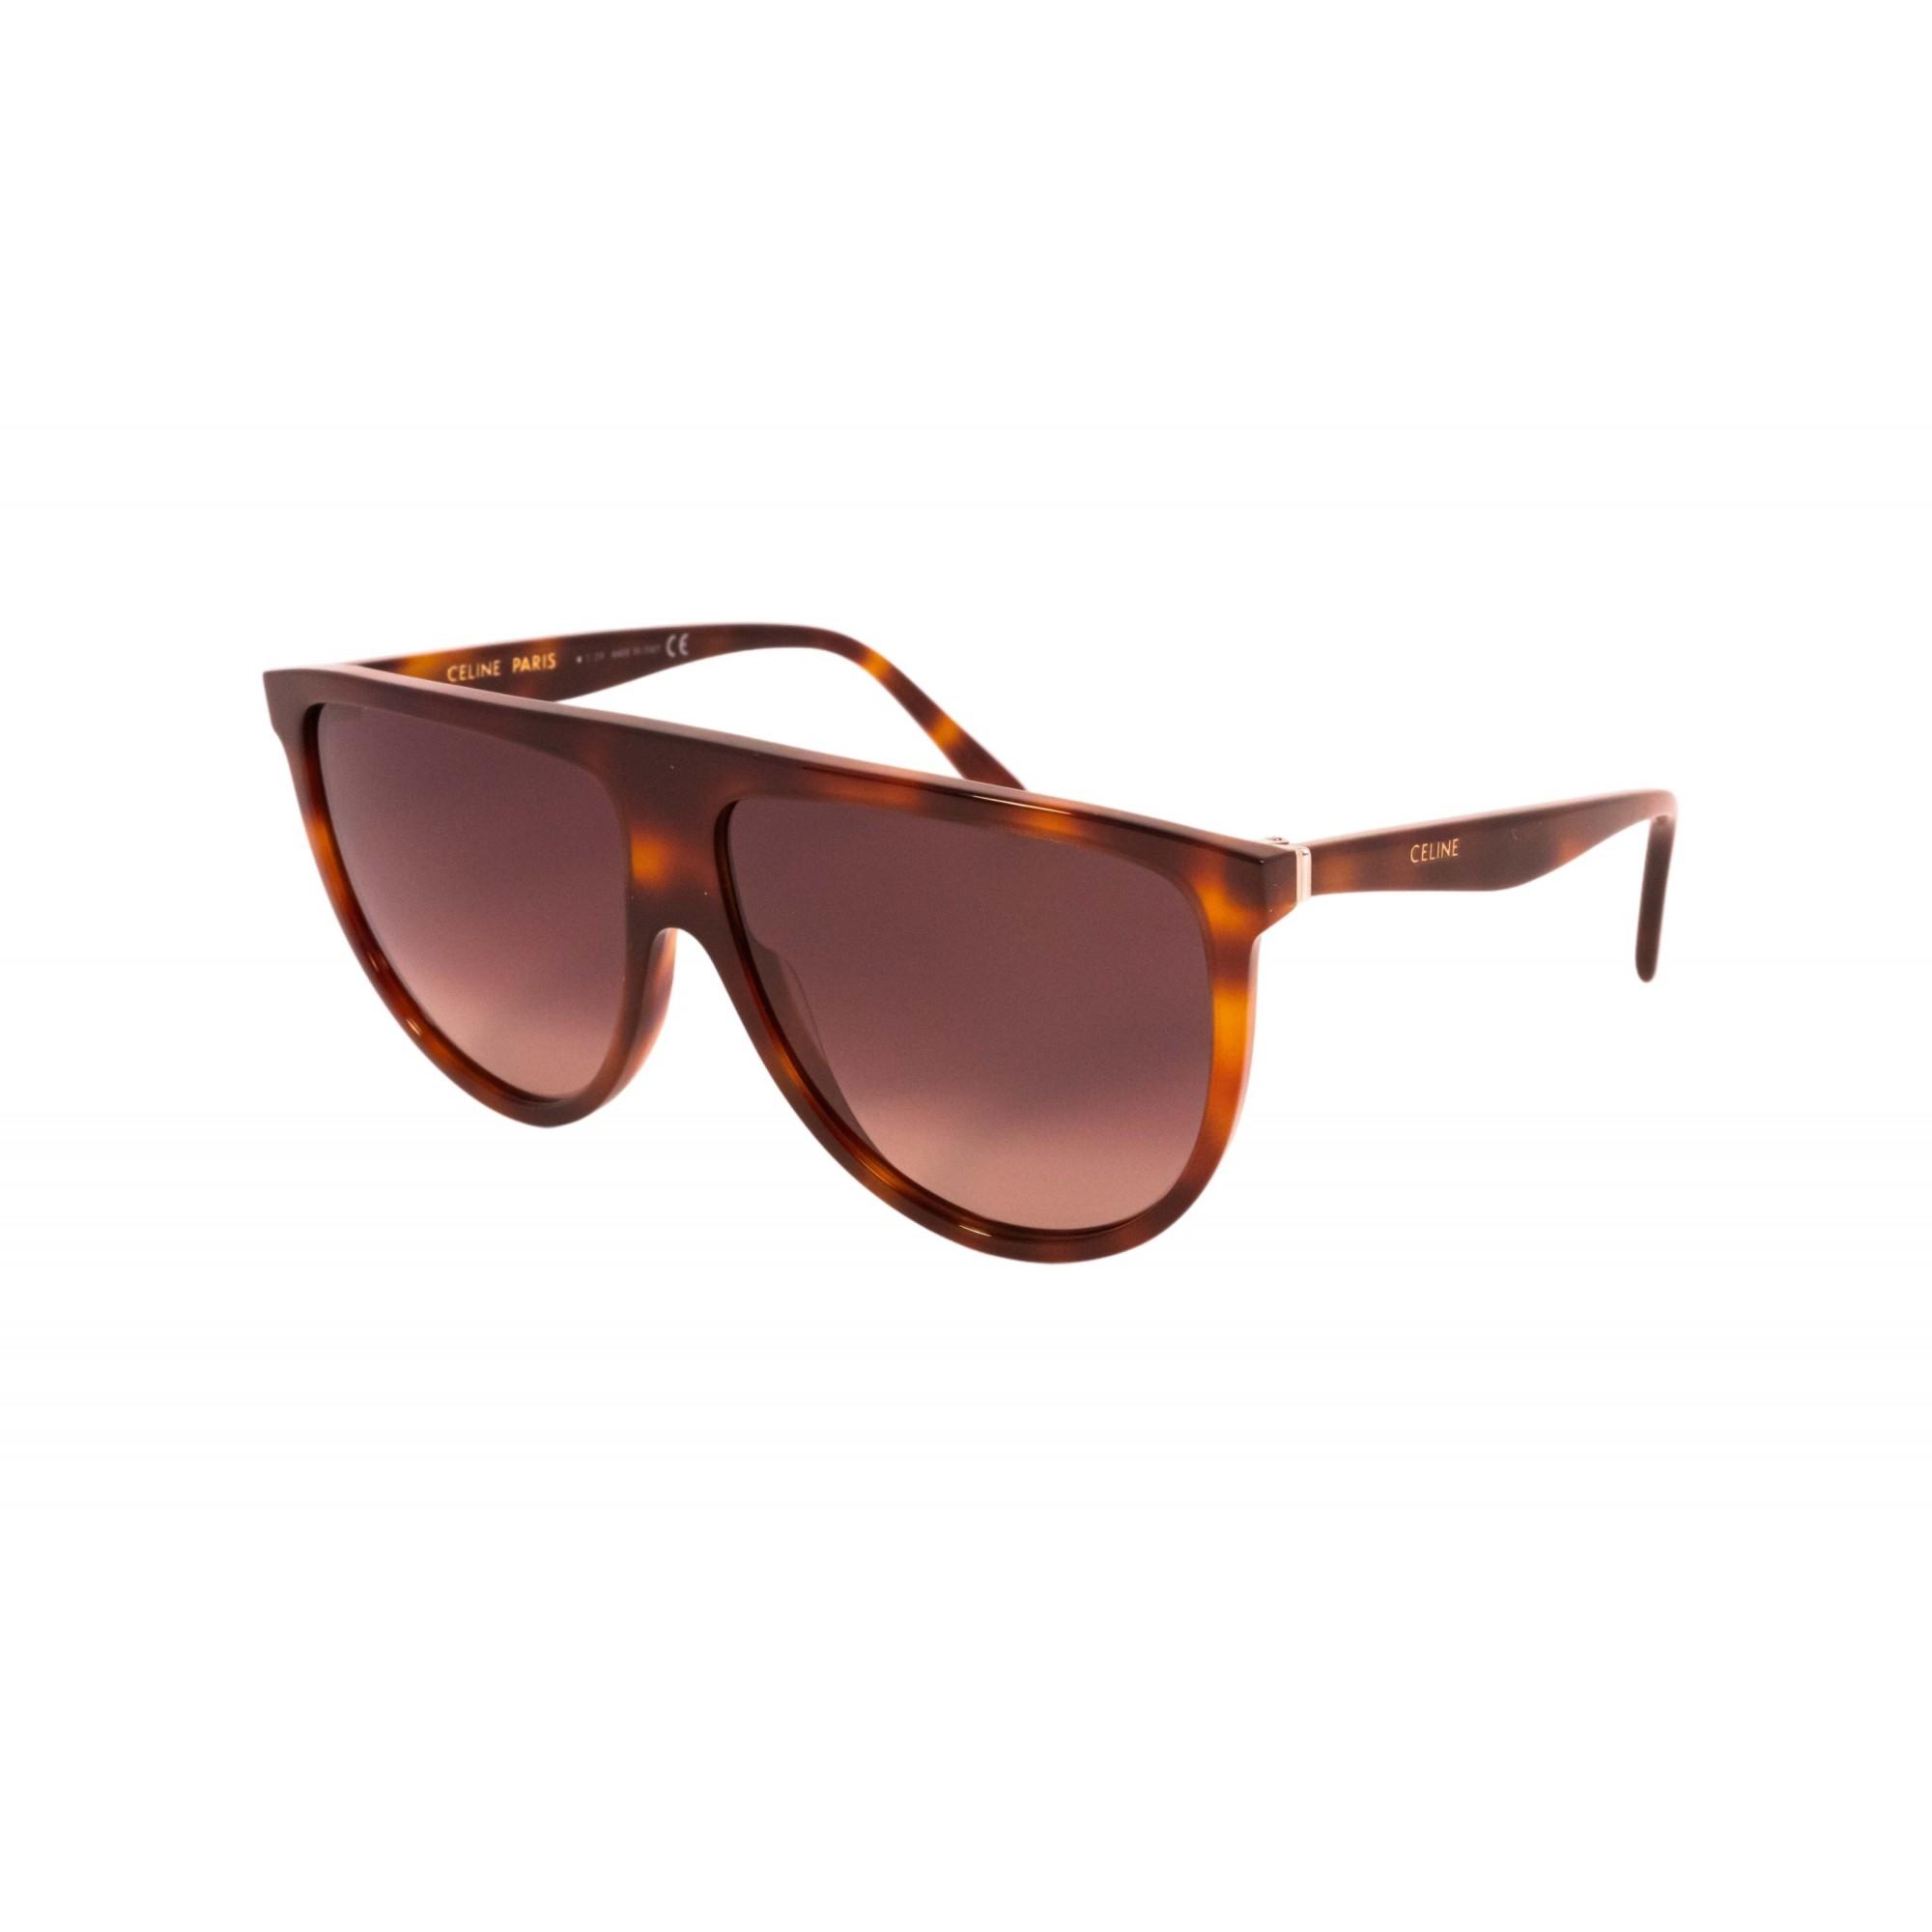 Óculos Celine Redondo cl4006in 53k 62 Tartaruga